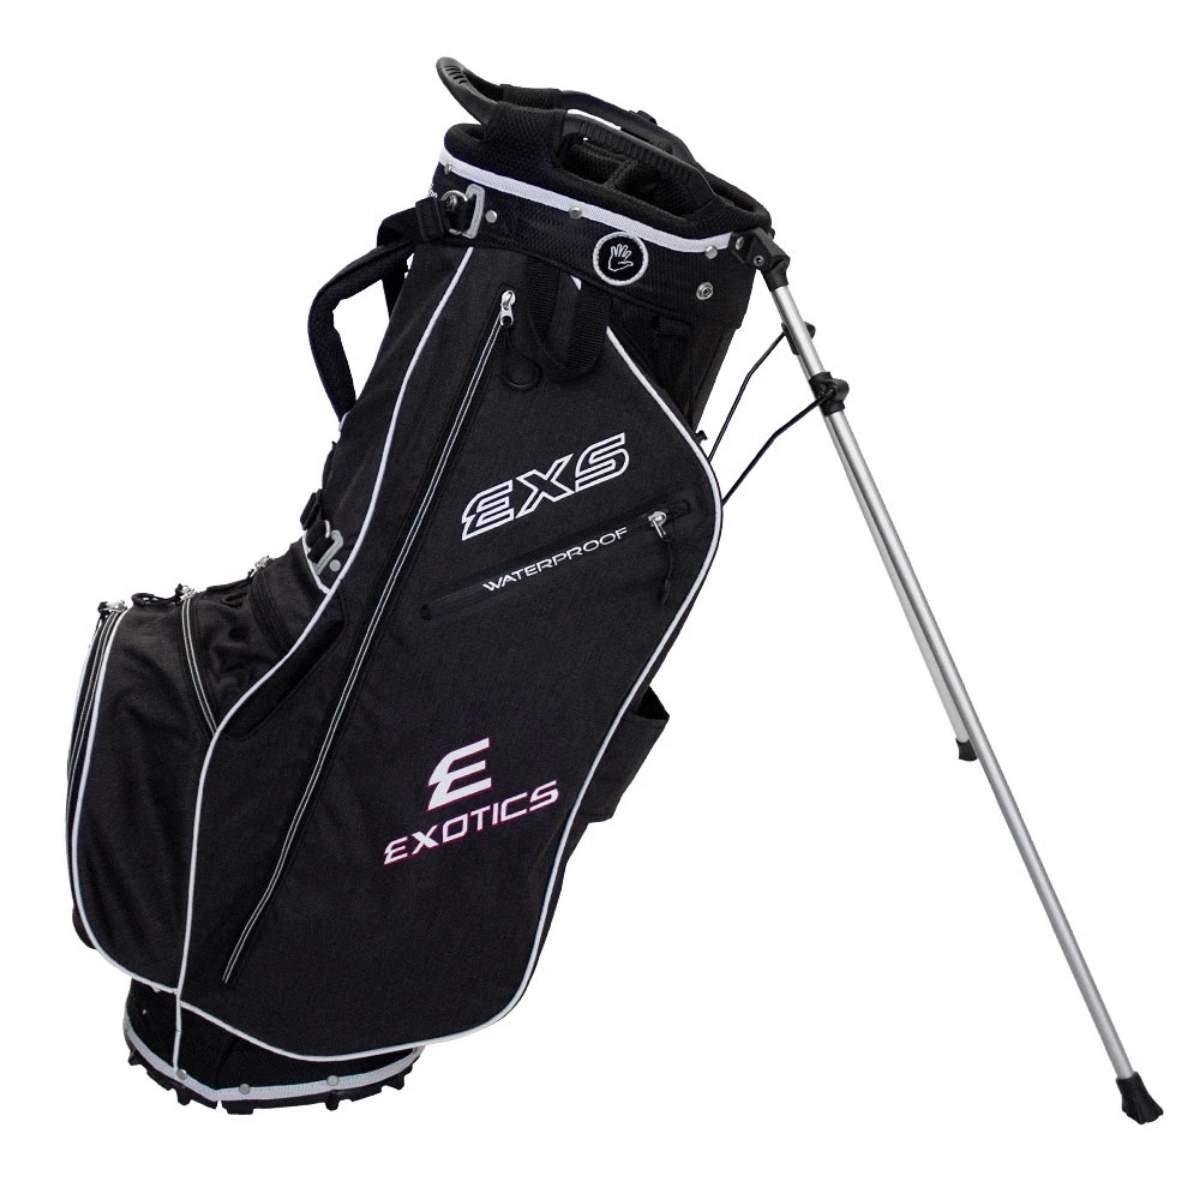 Tour Edge EXS Xtreme Stand Bag